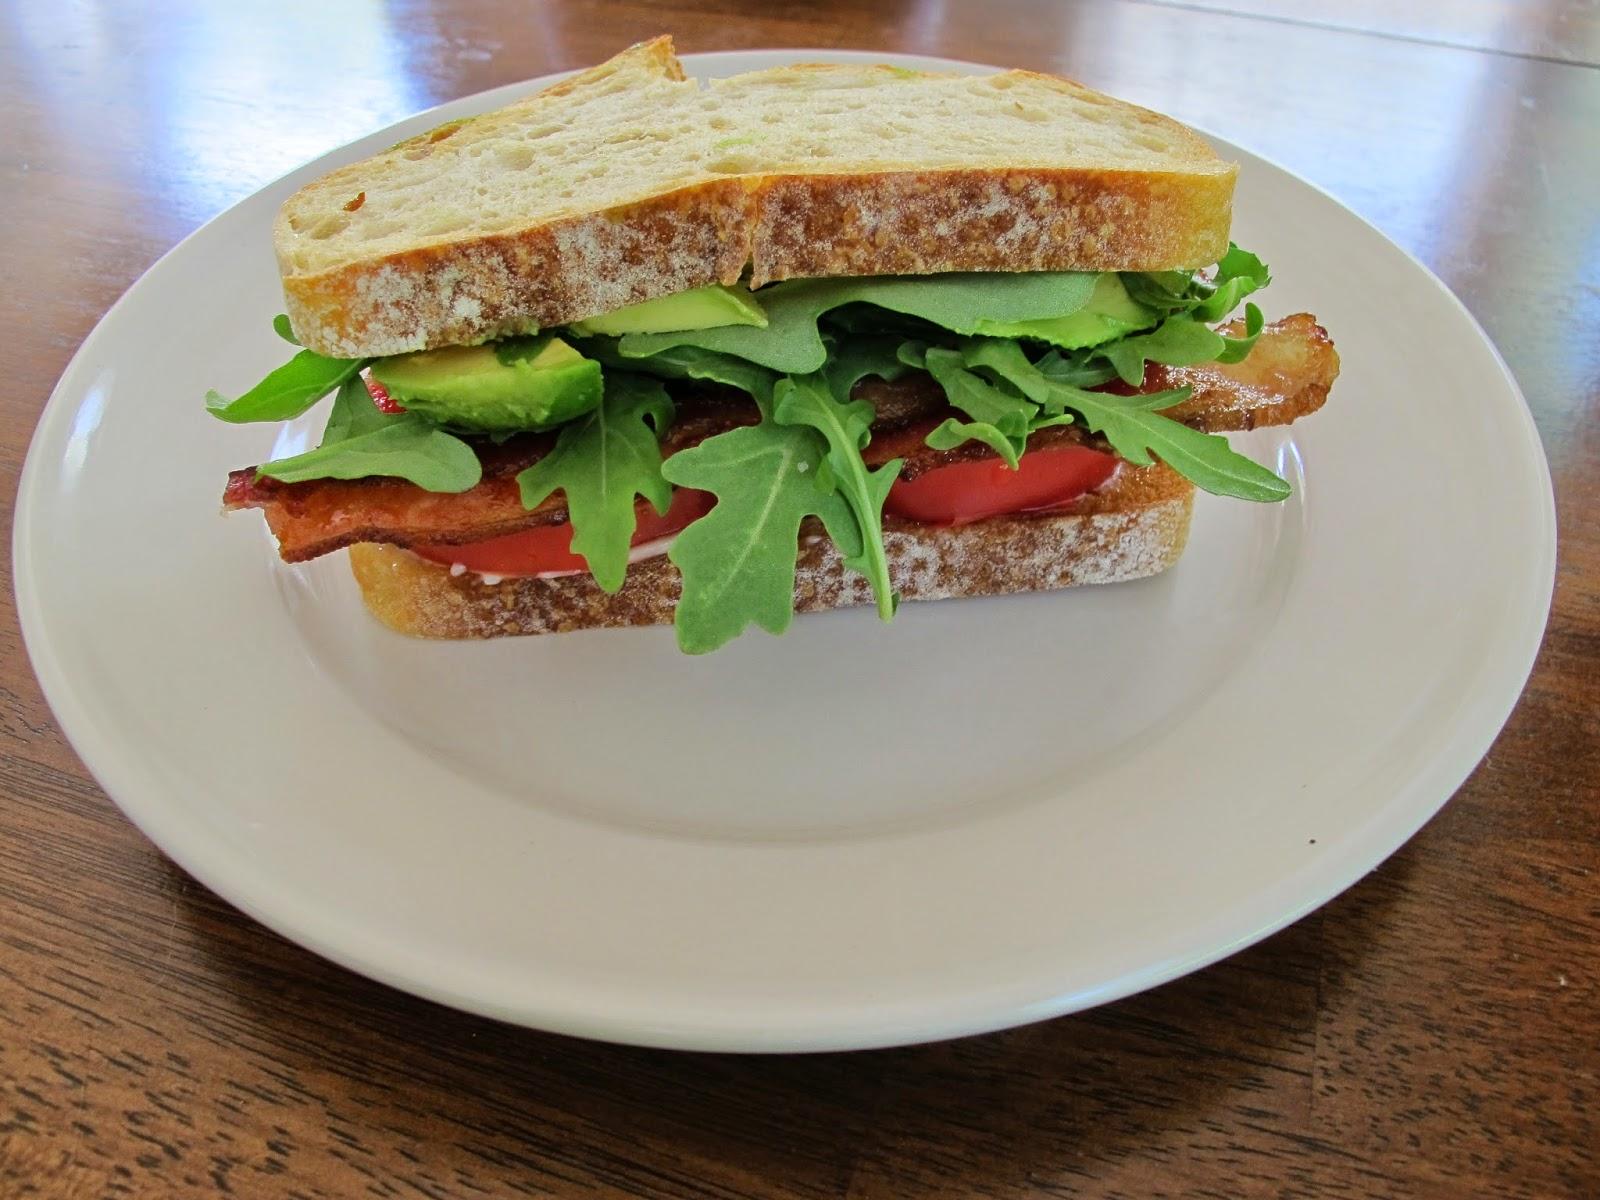 Heirloom Tomato BLT Sandwiches with Avocado